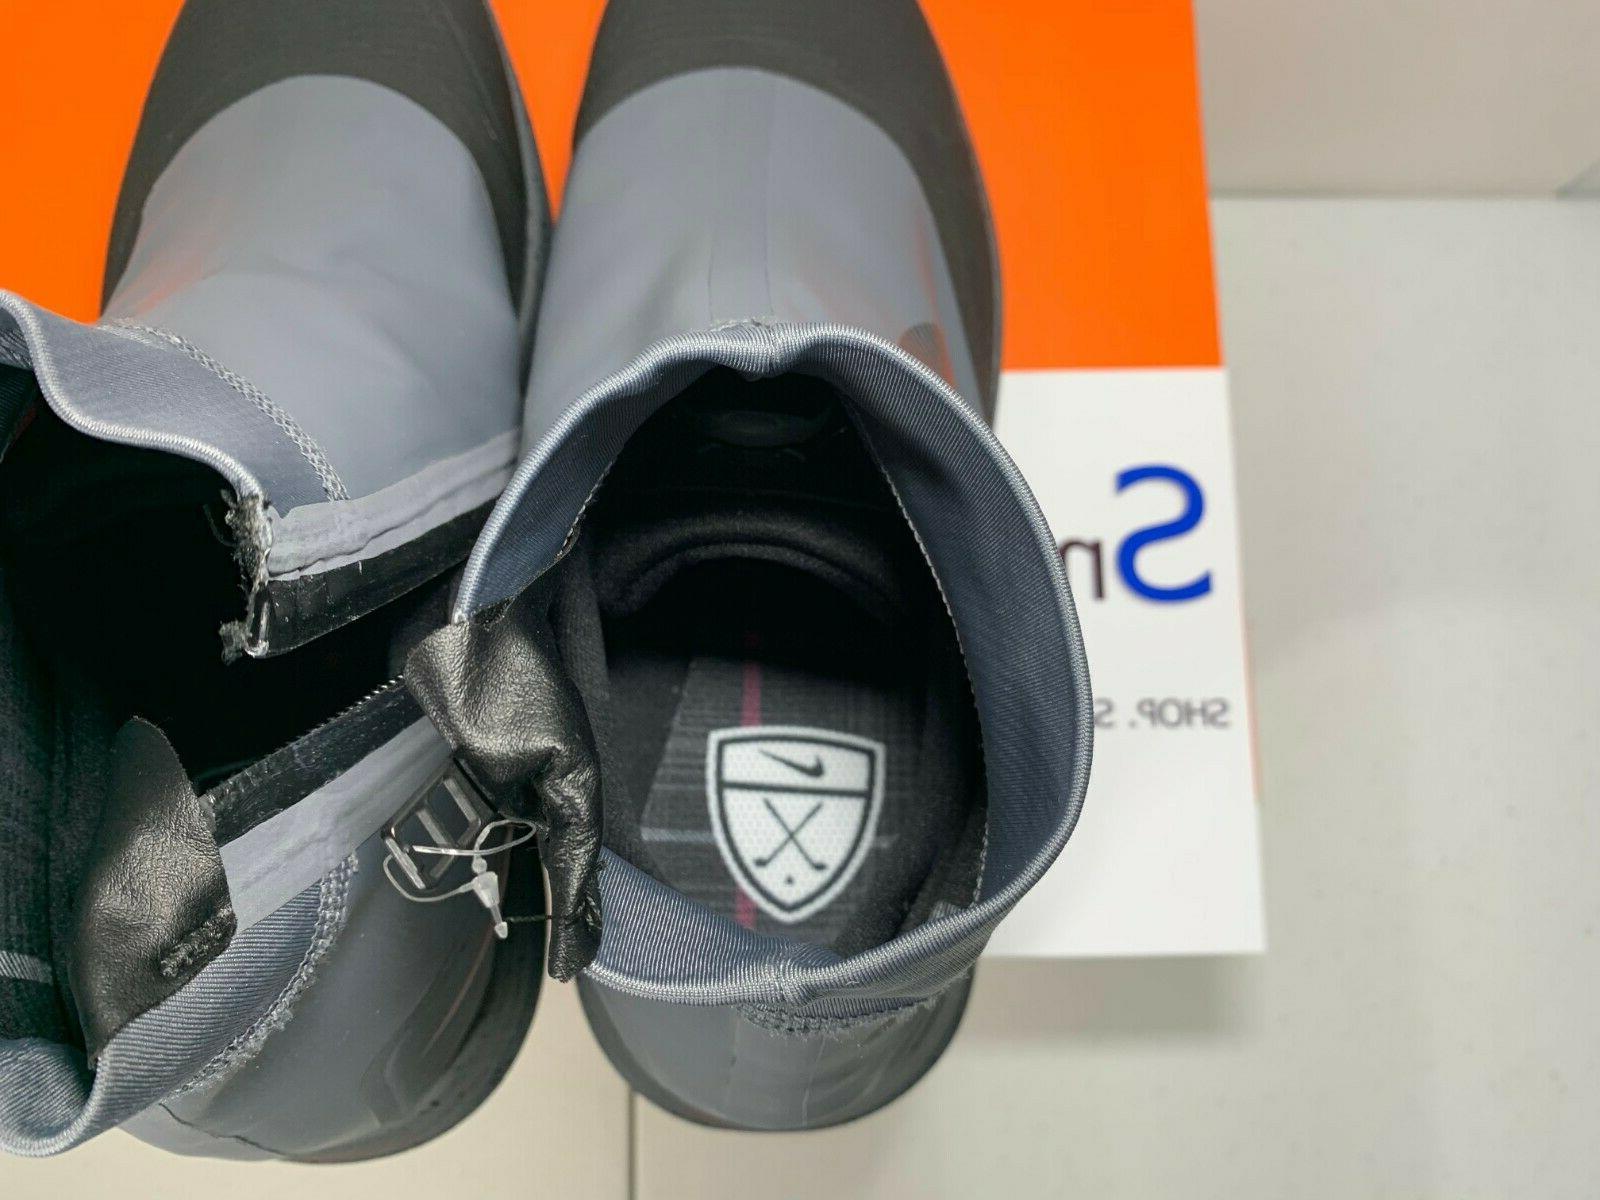 $180 NIB 8-12 MEN Nike VAPORSTORM BOA Golf Shoes Spikeless